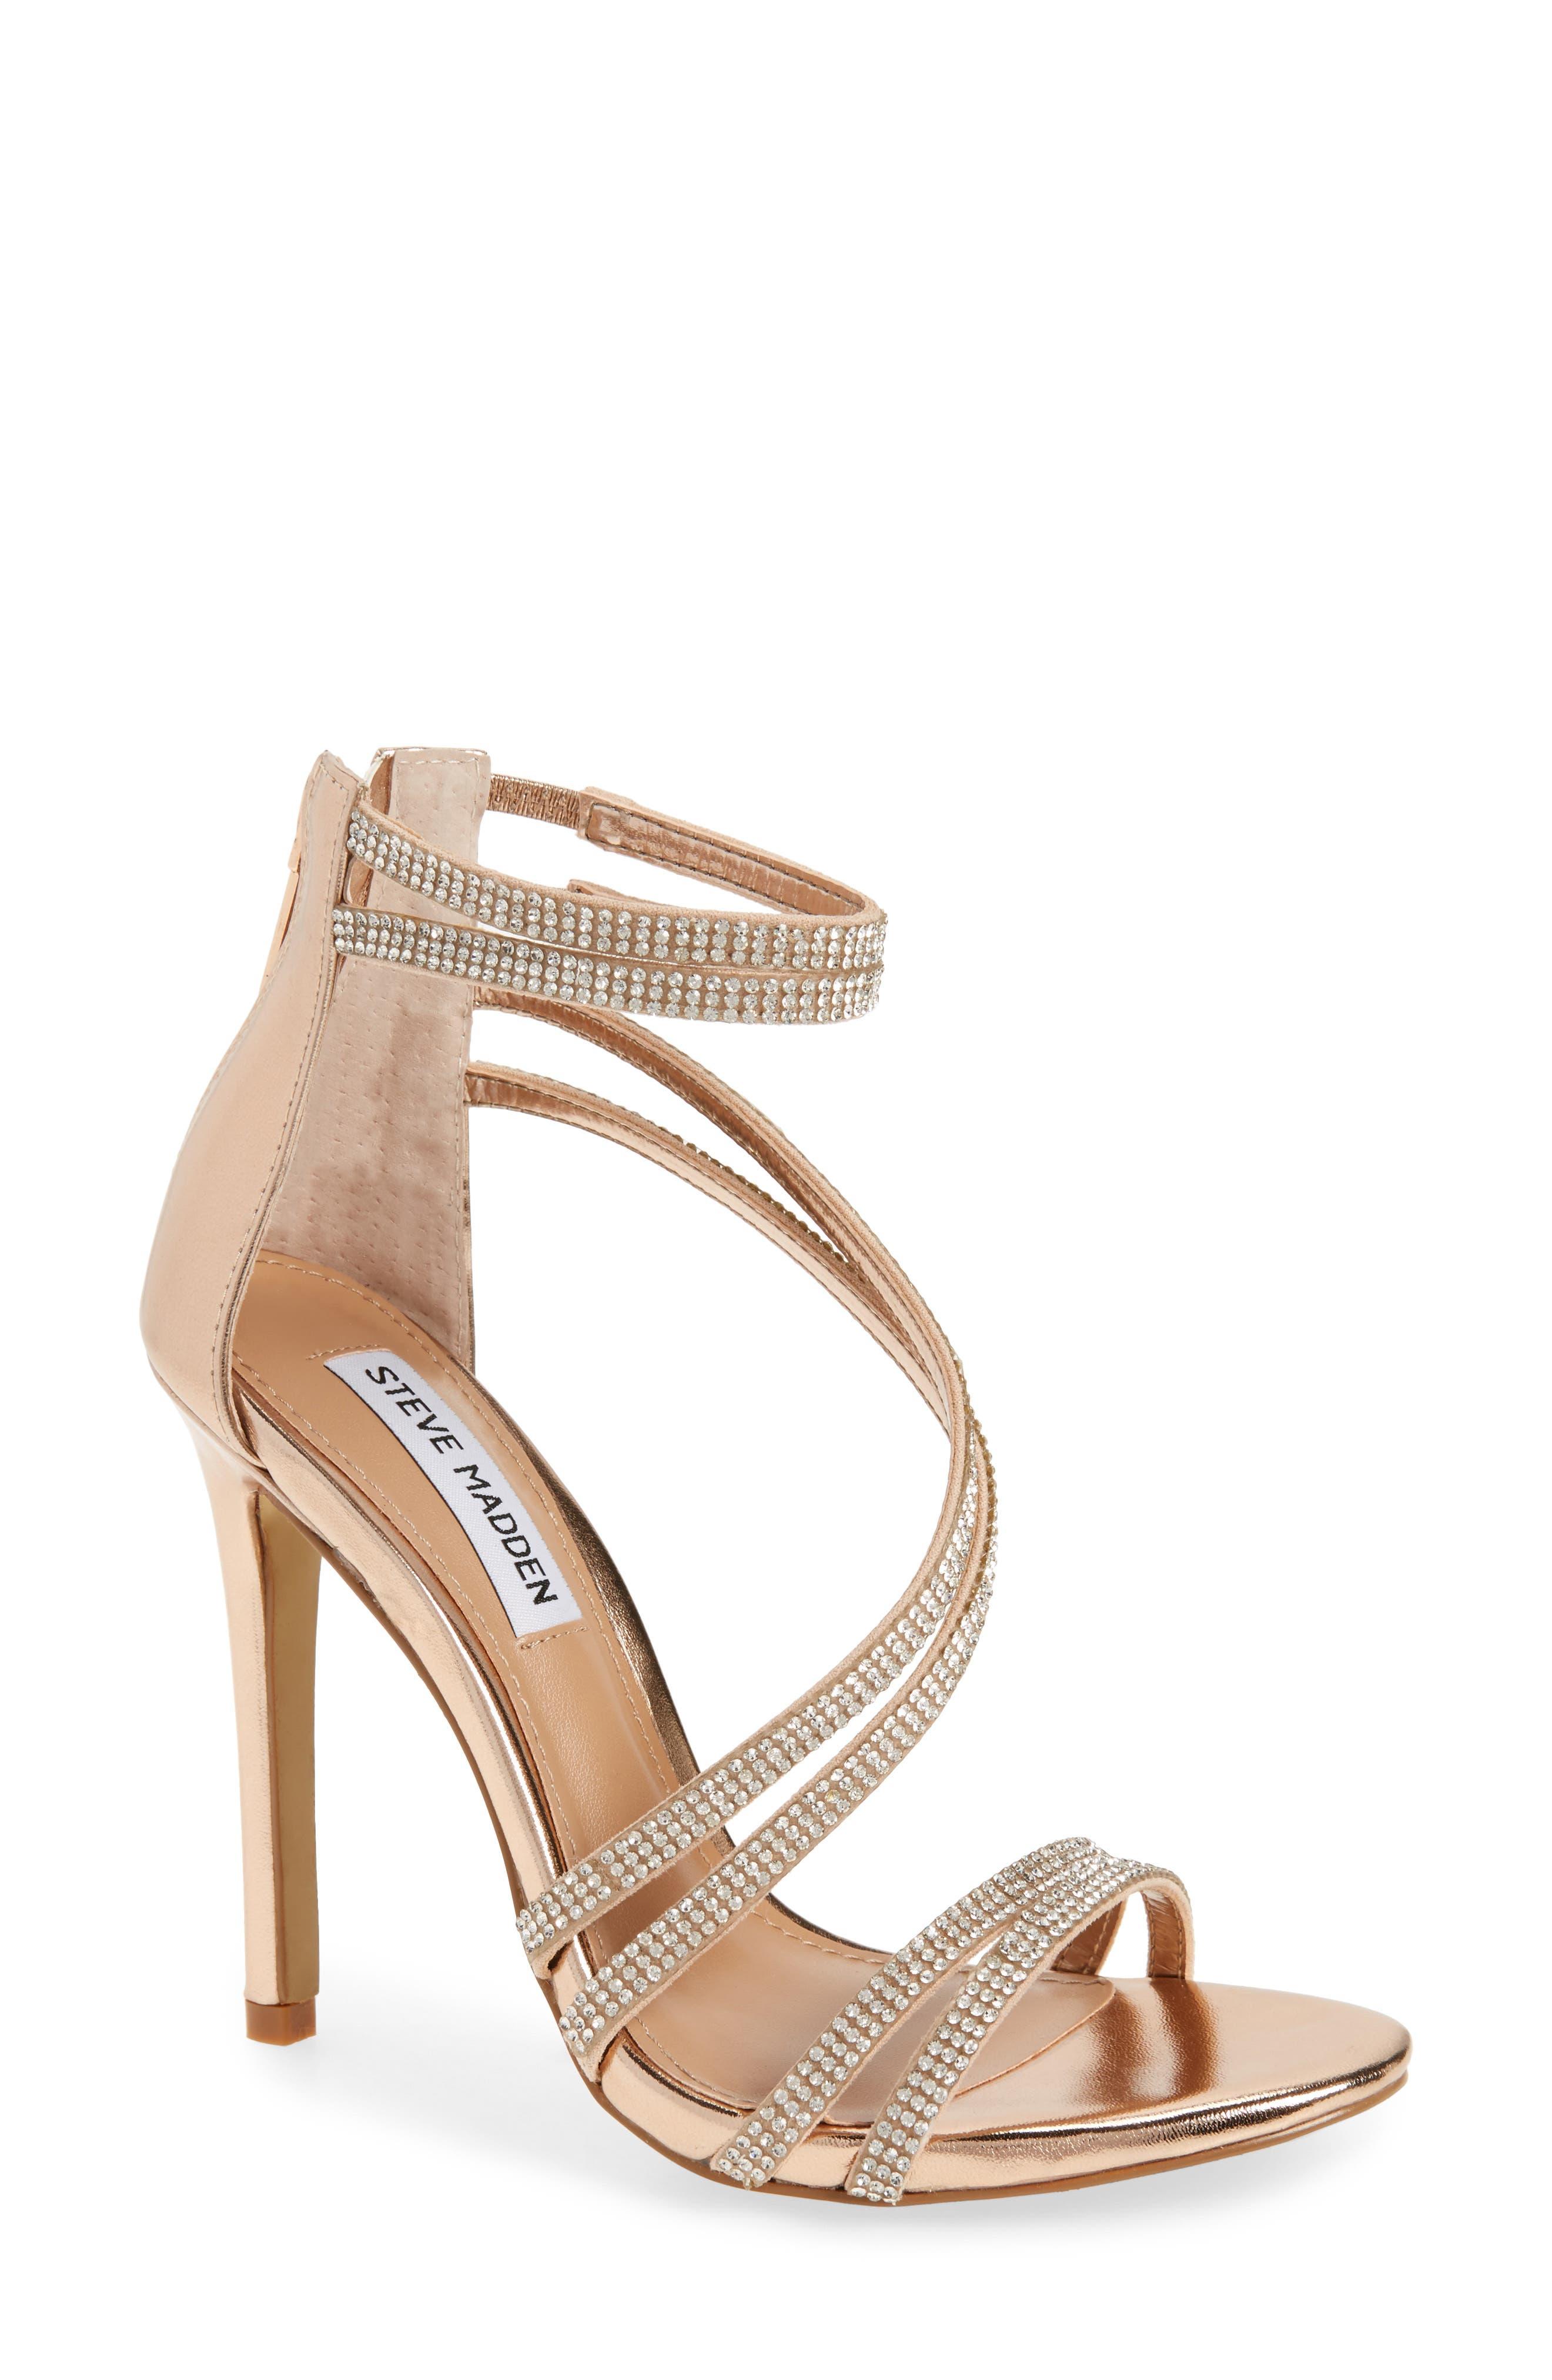 Main Image - Steve Madden Sweetest Embellished Sandal (Women)